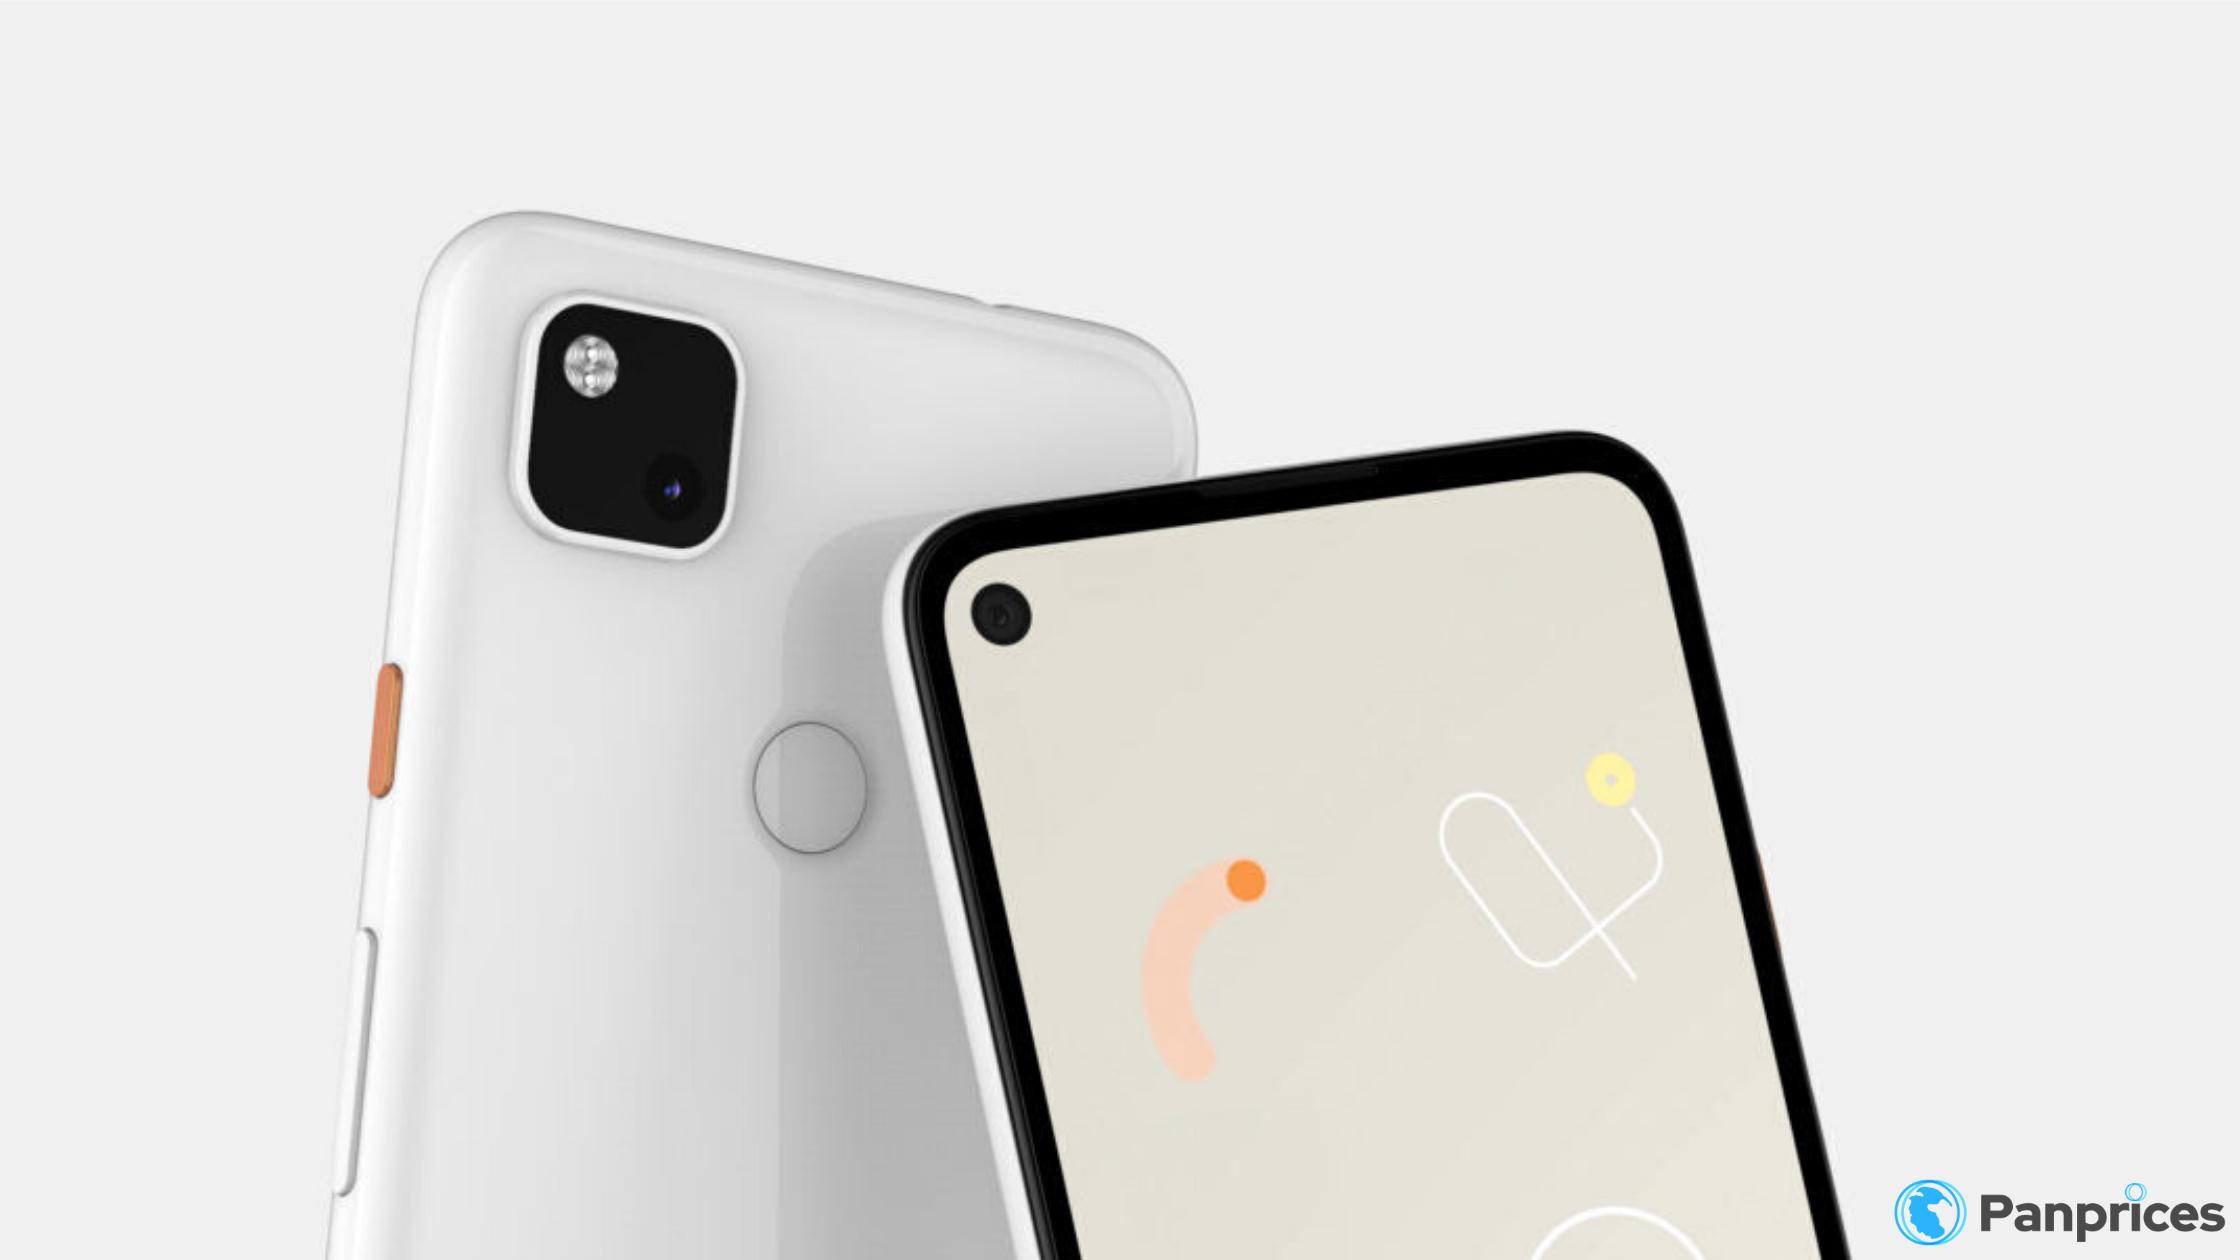 Kommer Google Pixel 4a heta Pixel 5 istället?